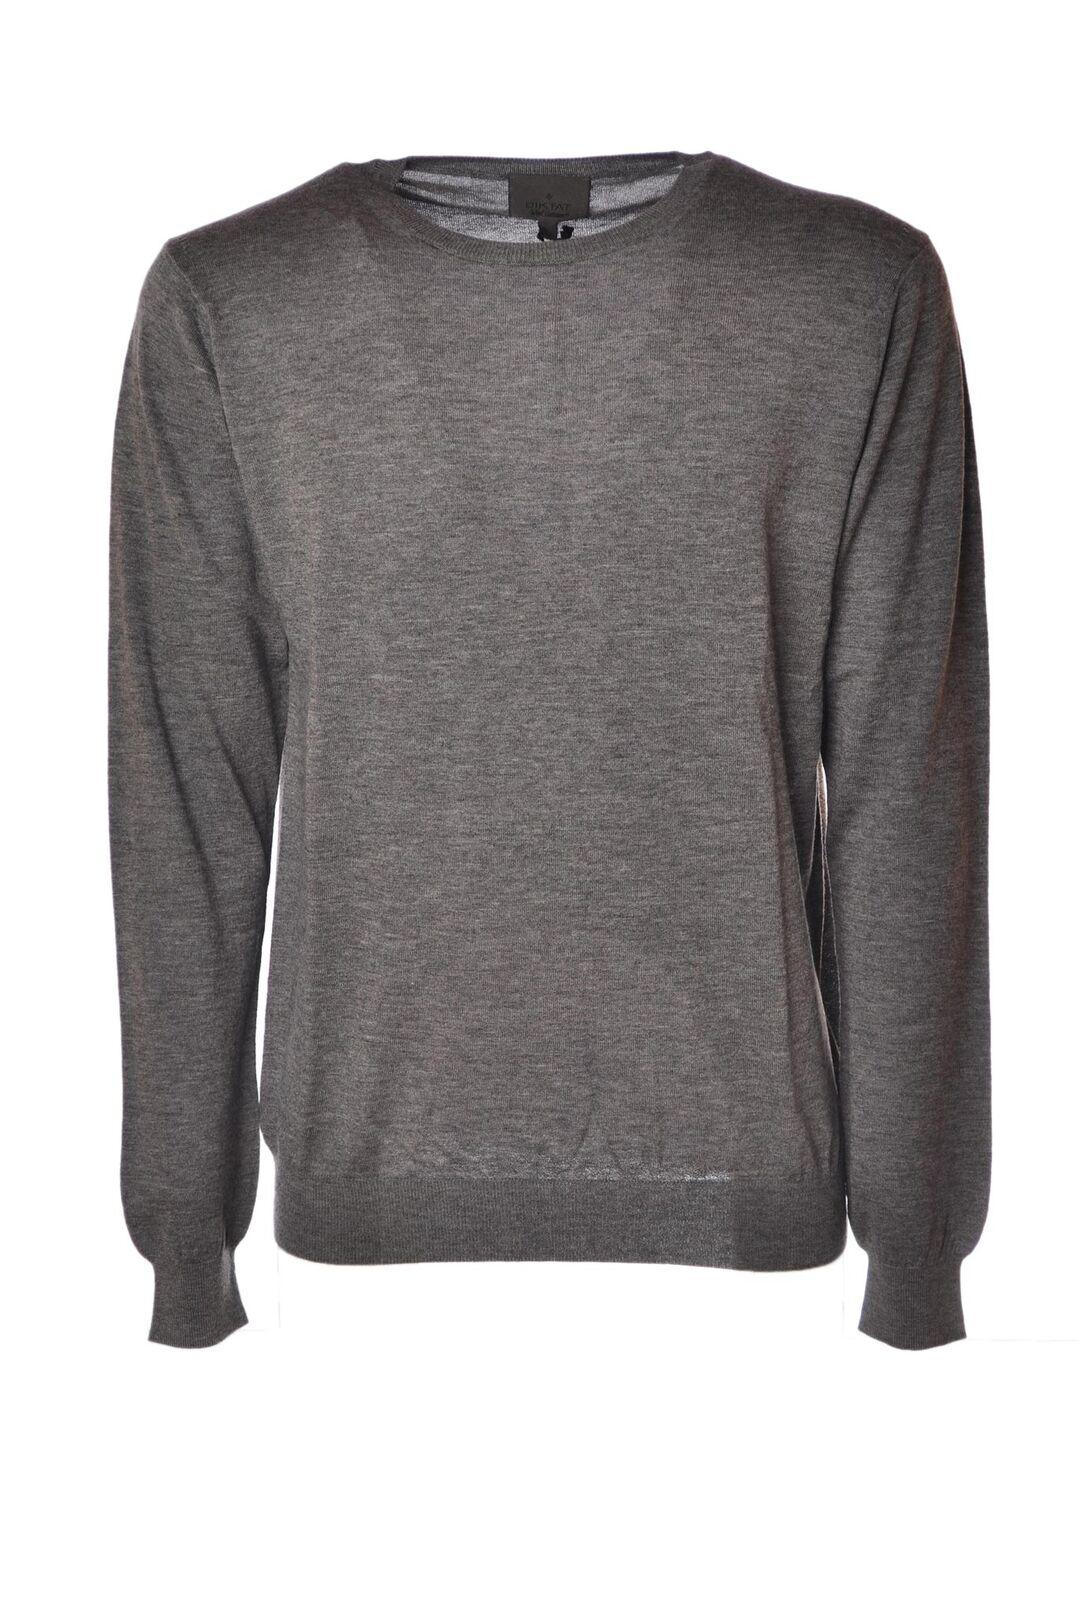 Diktat  -  Sweaters - Male - Grau - 4339226A185454